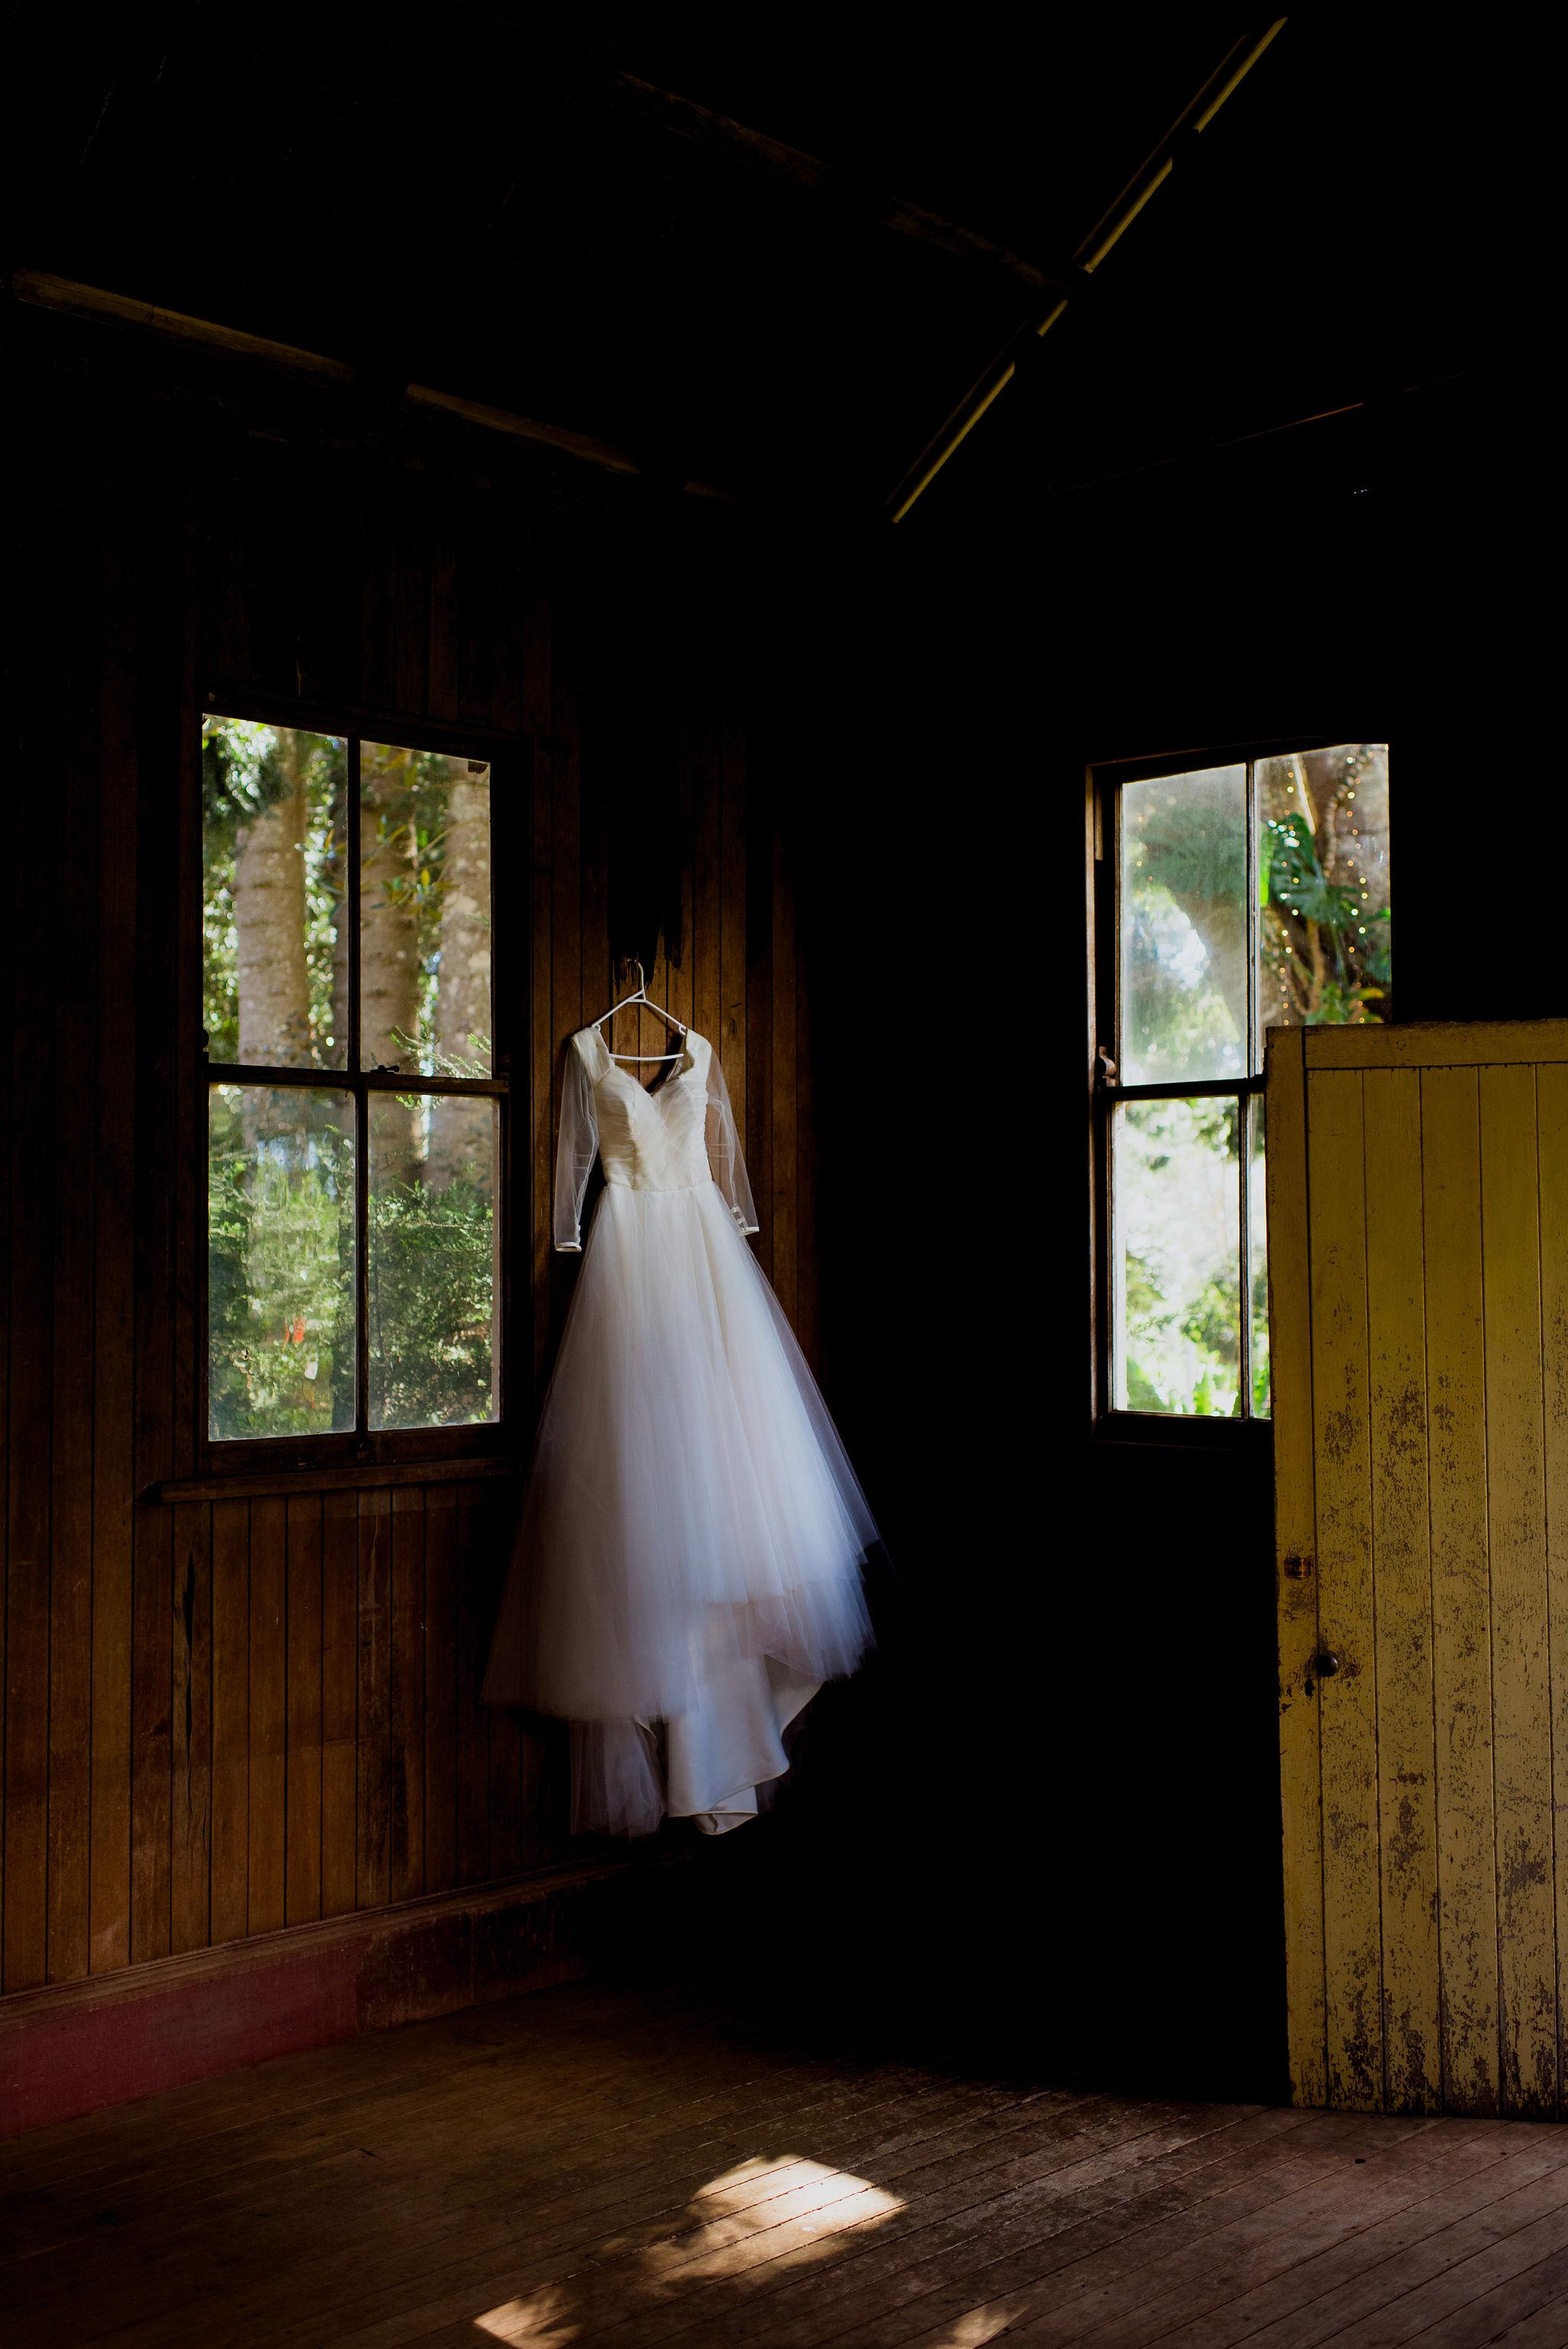 Wedding dress hanging in rustic wooden barn